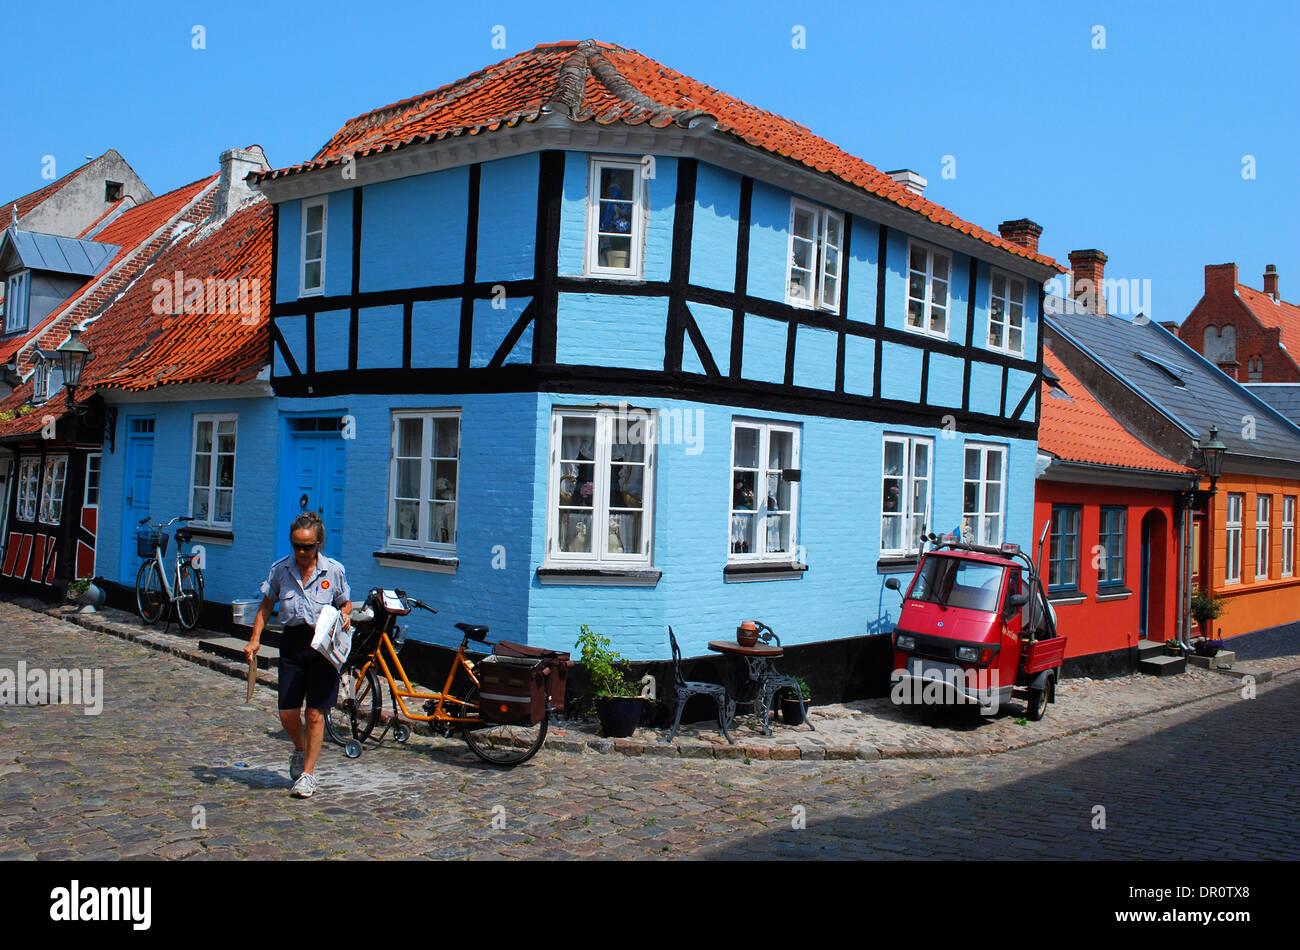 Aero island, Aeroskobing, postwoman at work, fyn, Denmark, Scandinavia, Europe - Stock Image